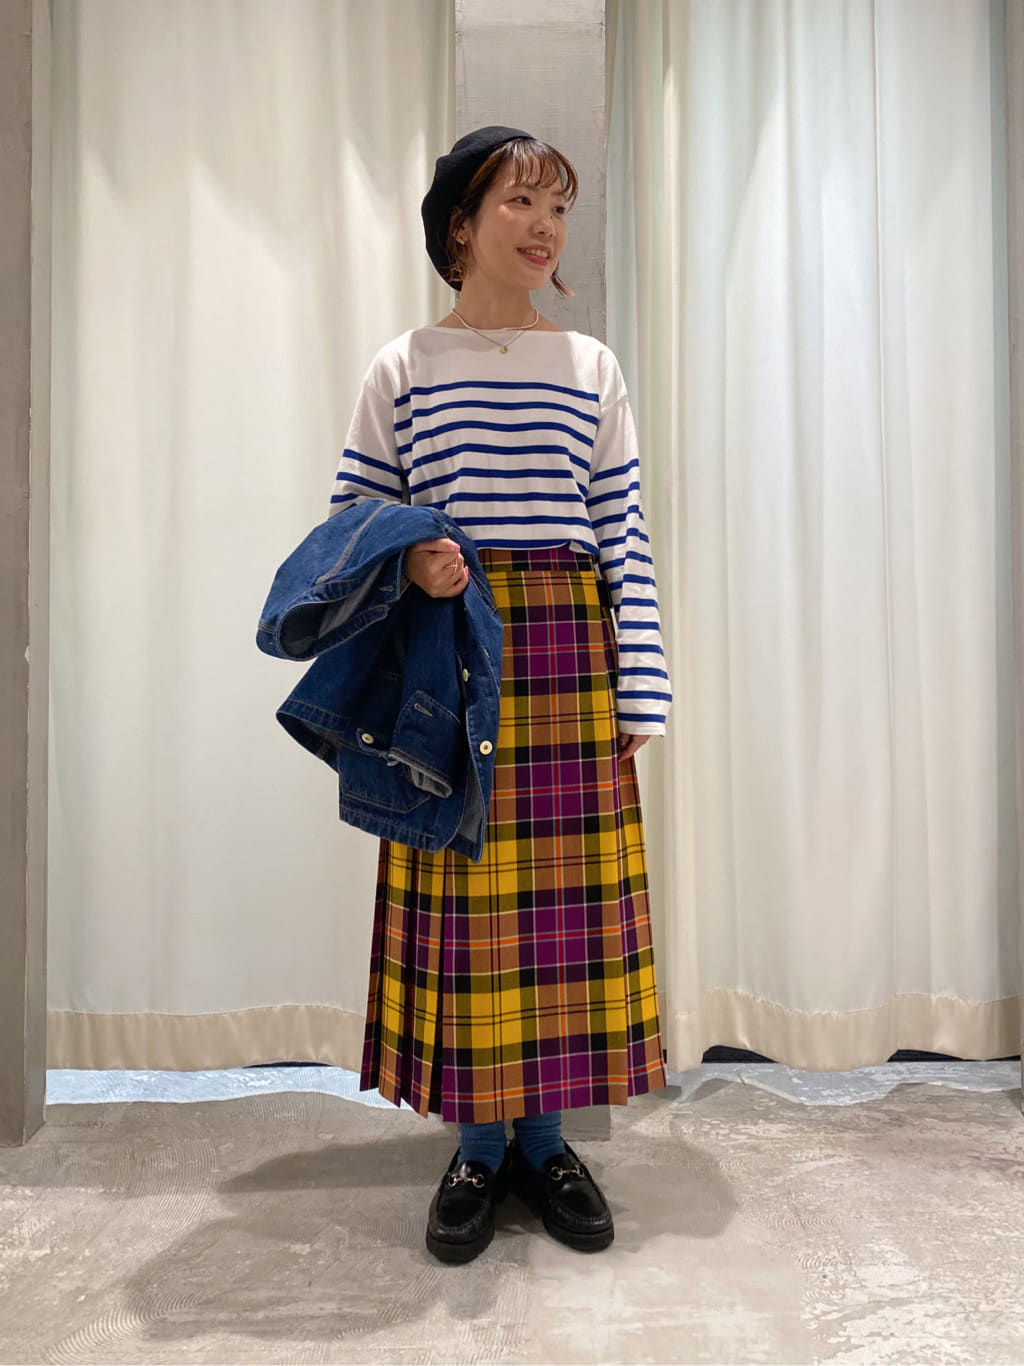 - CHILD WOMAN CHILD WOMAN , PAR ICI ルミネ横浜 身長:153cm 2021.10.04